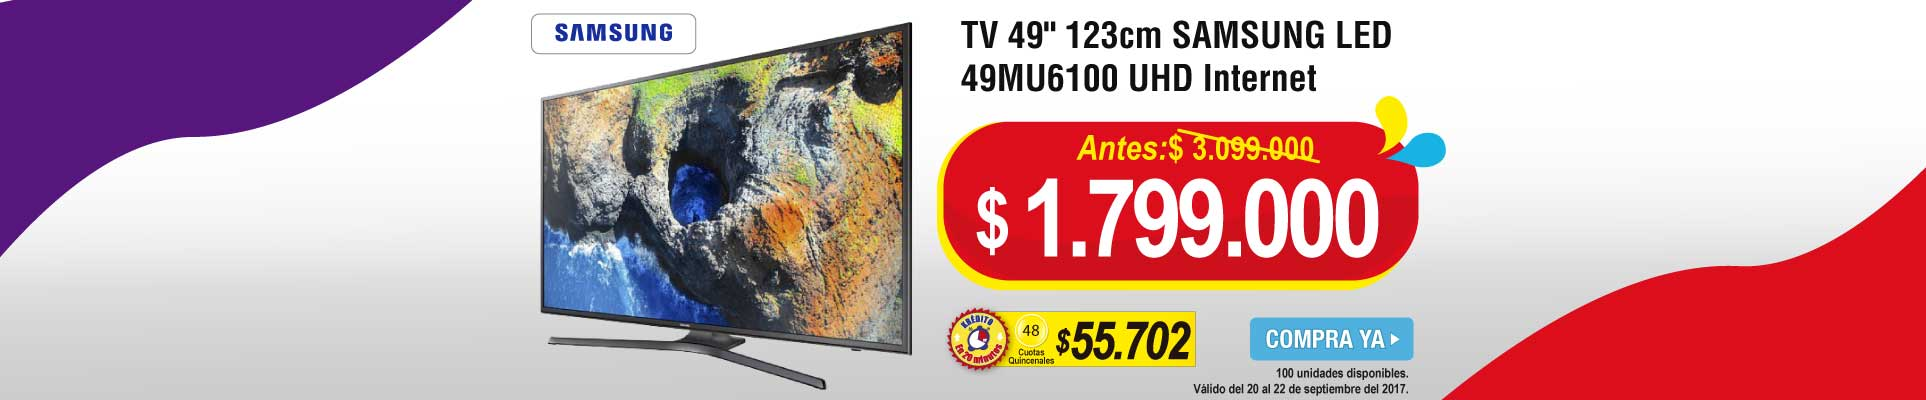 PPAL ALKP-2-tv-TV 49 123cm SAMSUNG LED 49MU6100-prod-septiembre20-22